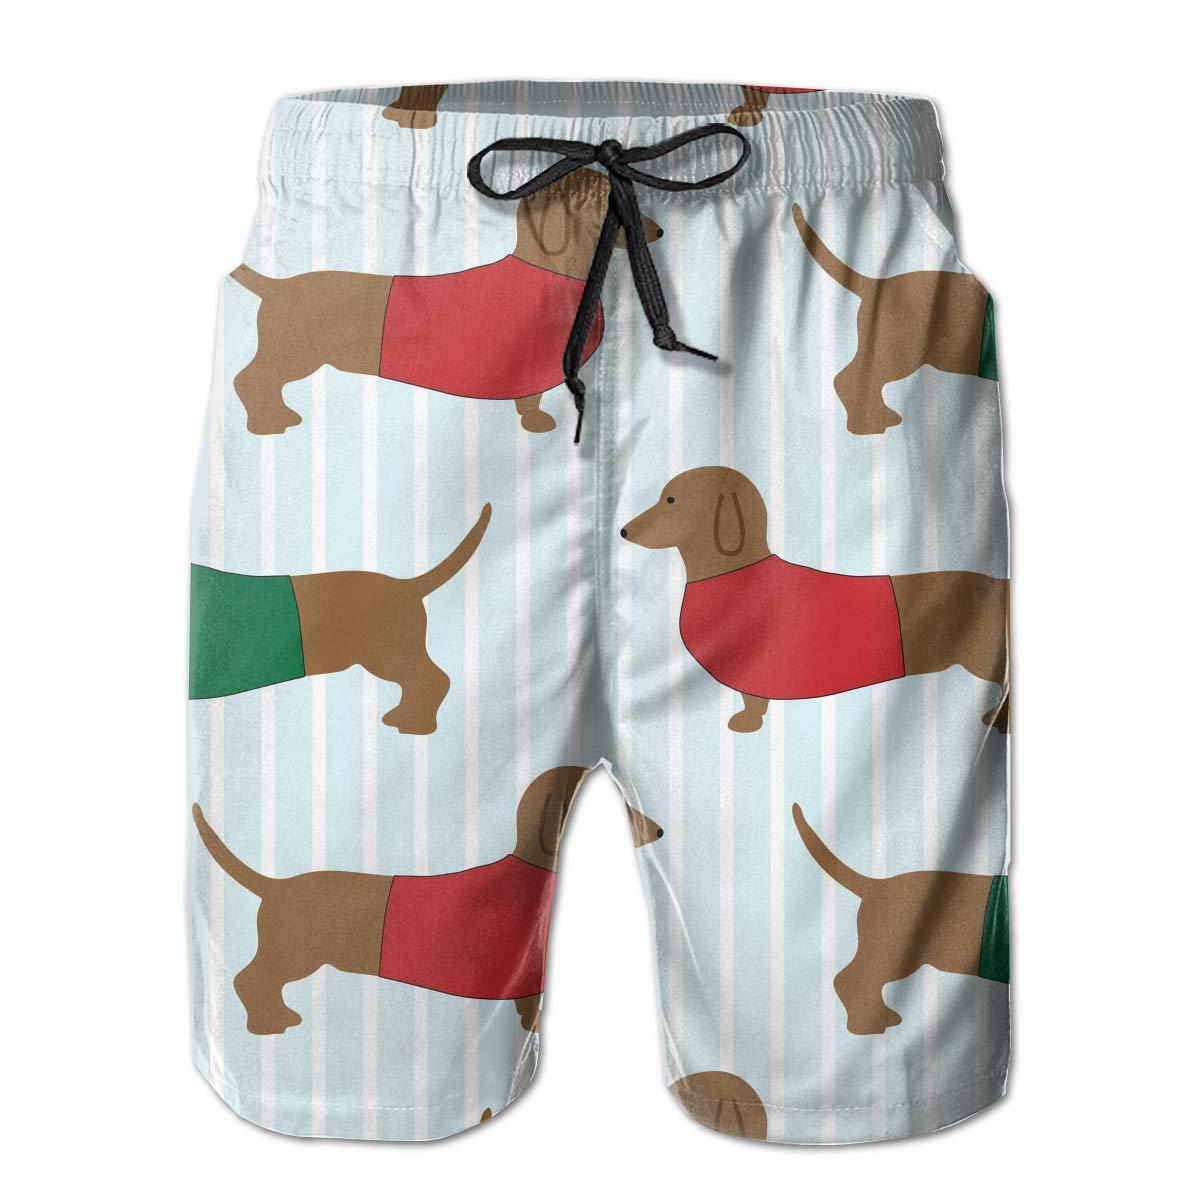 Life Pstore Mens Beach Swimming Trunks Funny Dachshund Swimsuit Swim Underwear Boardshorts with Pocket